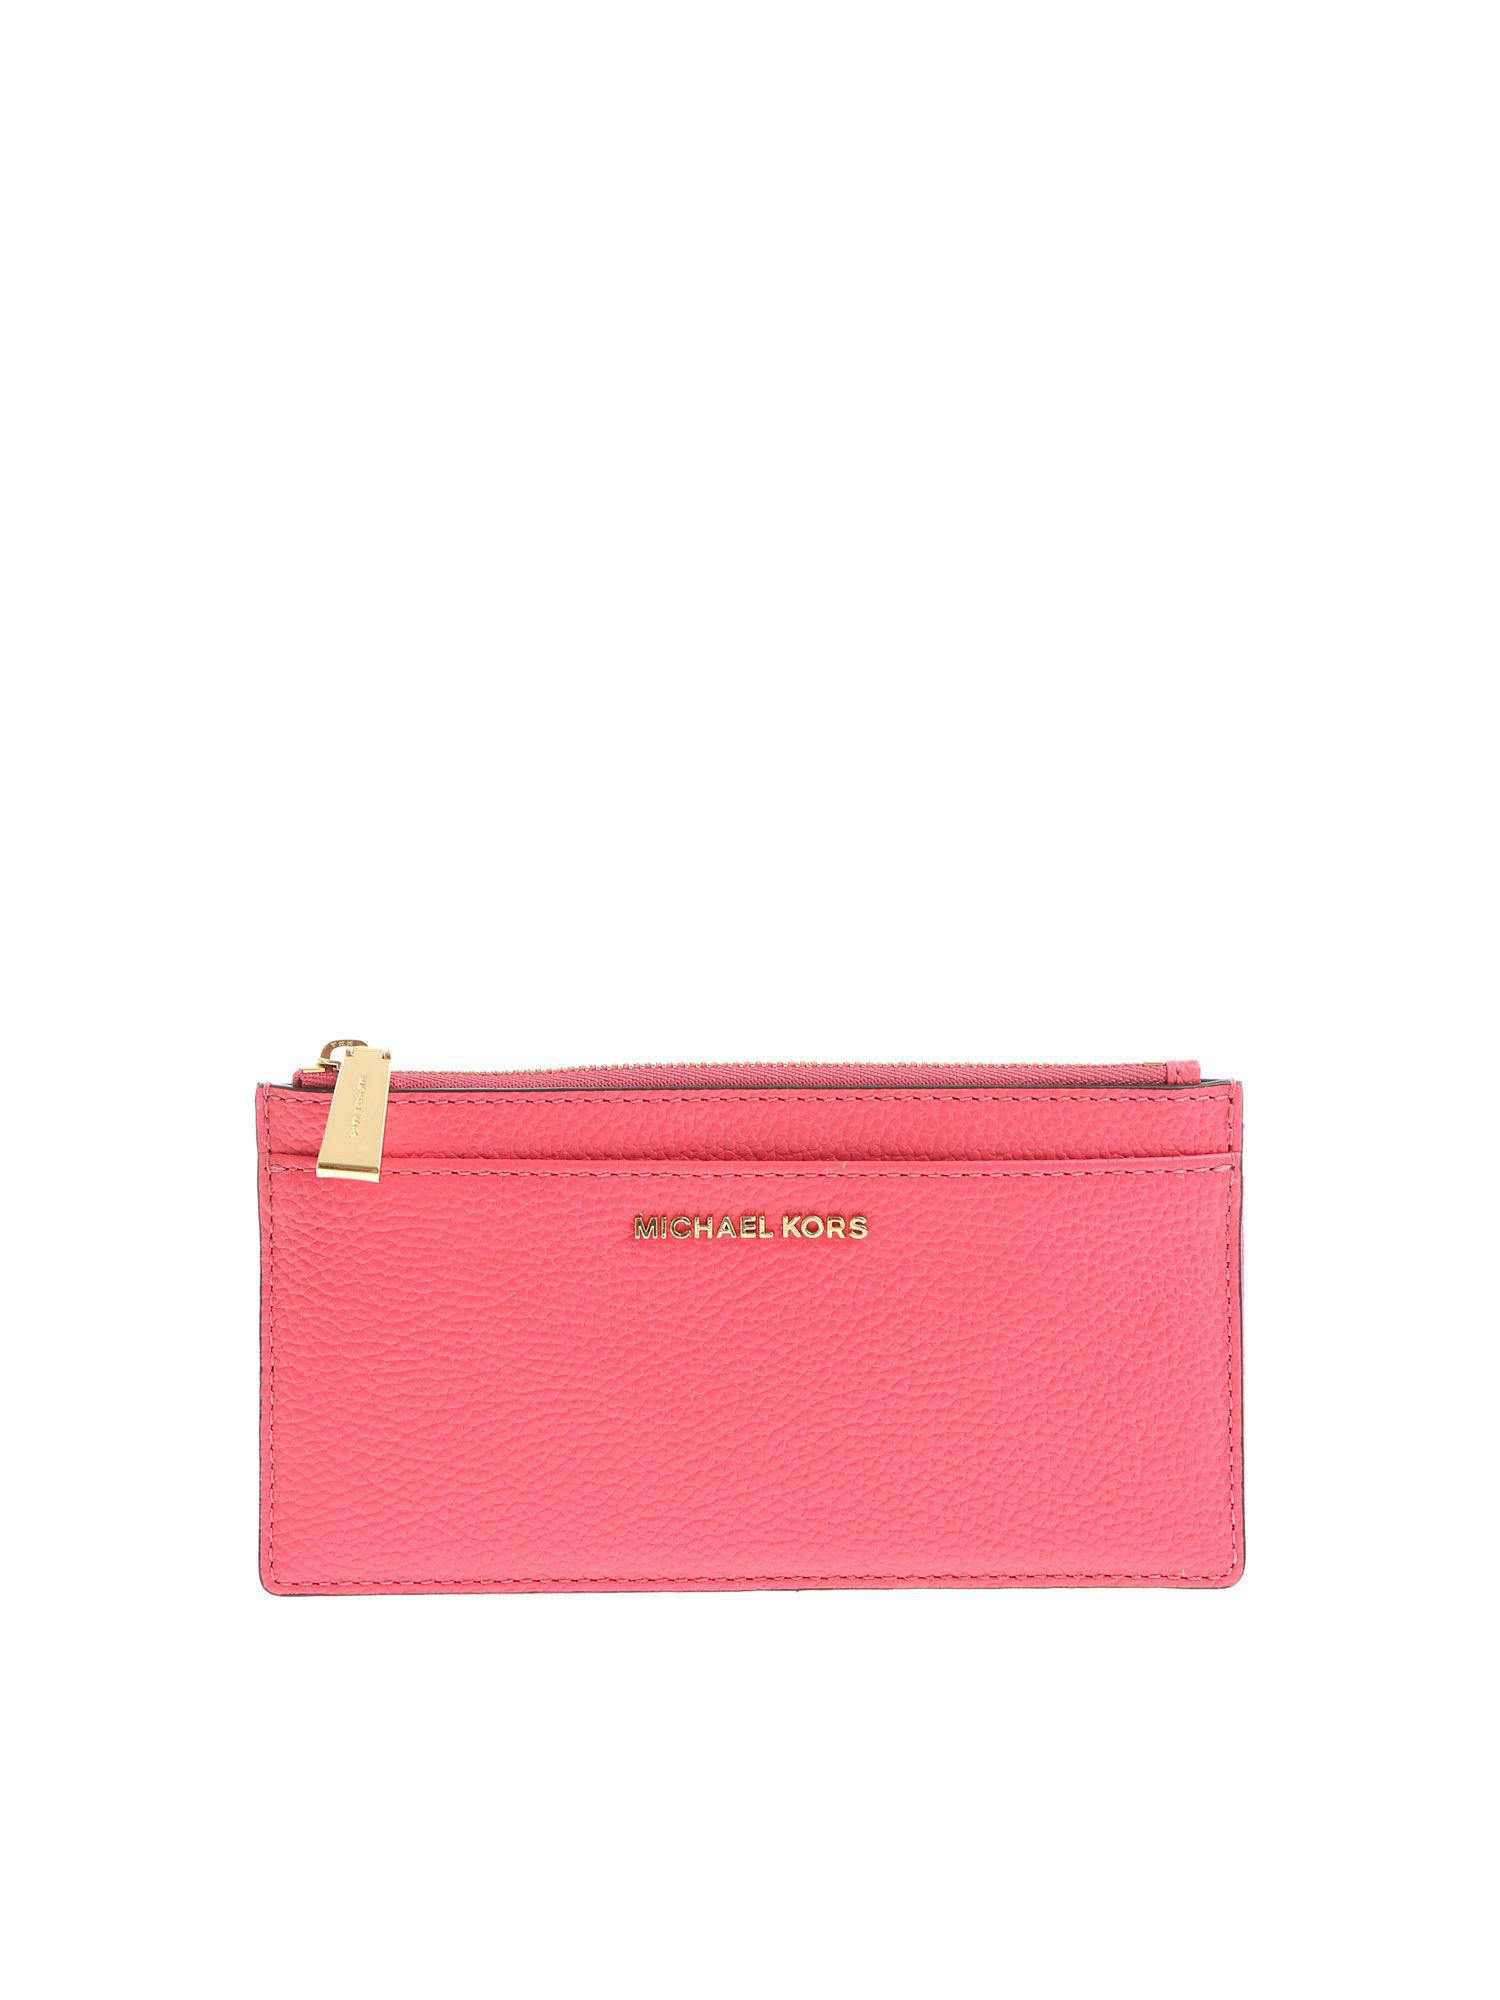 637a48787bd2 Michael Kors - Pink Fuchsia Leather Card Holder - Lyst. View fullscreen